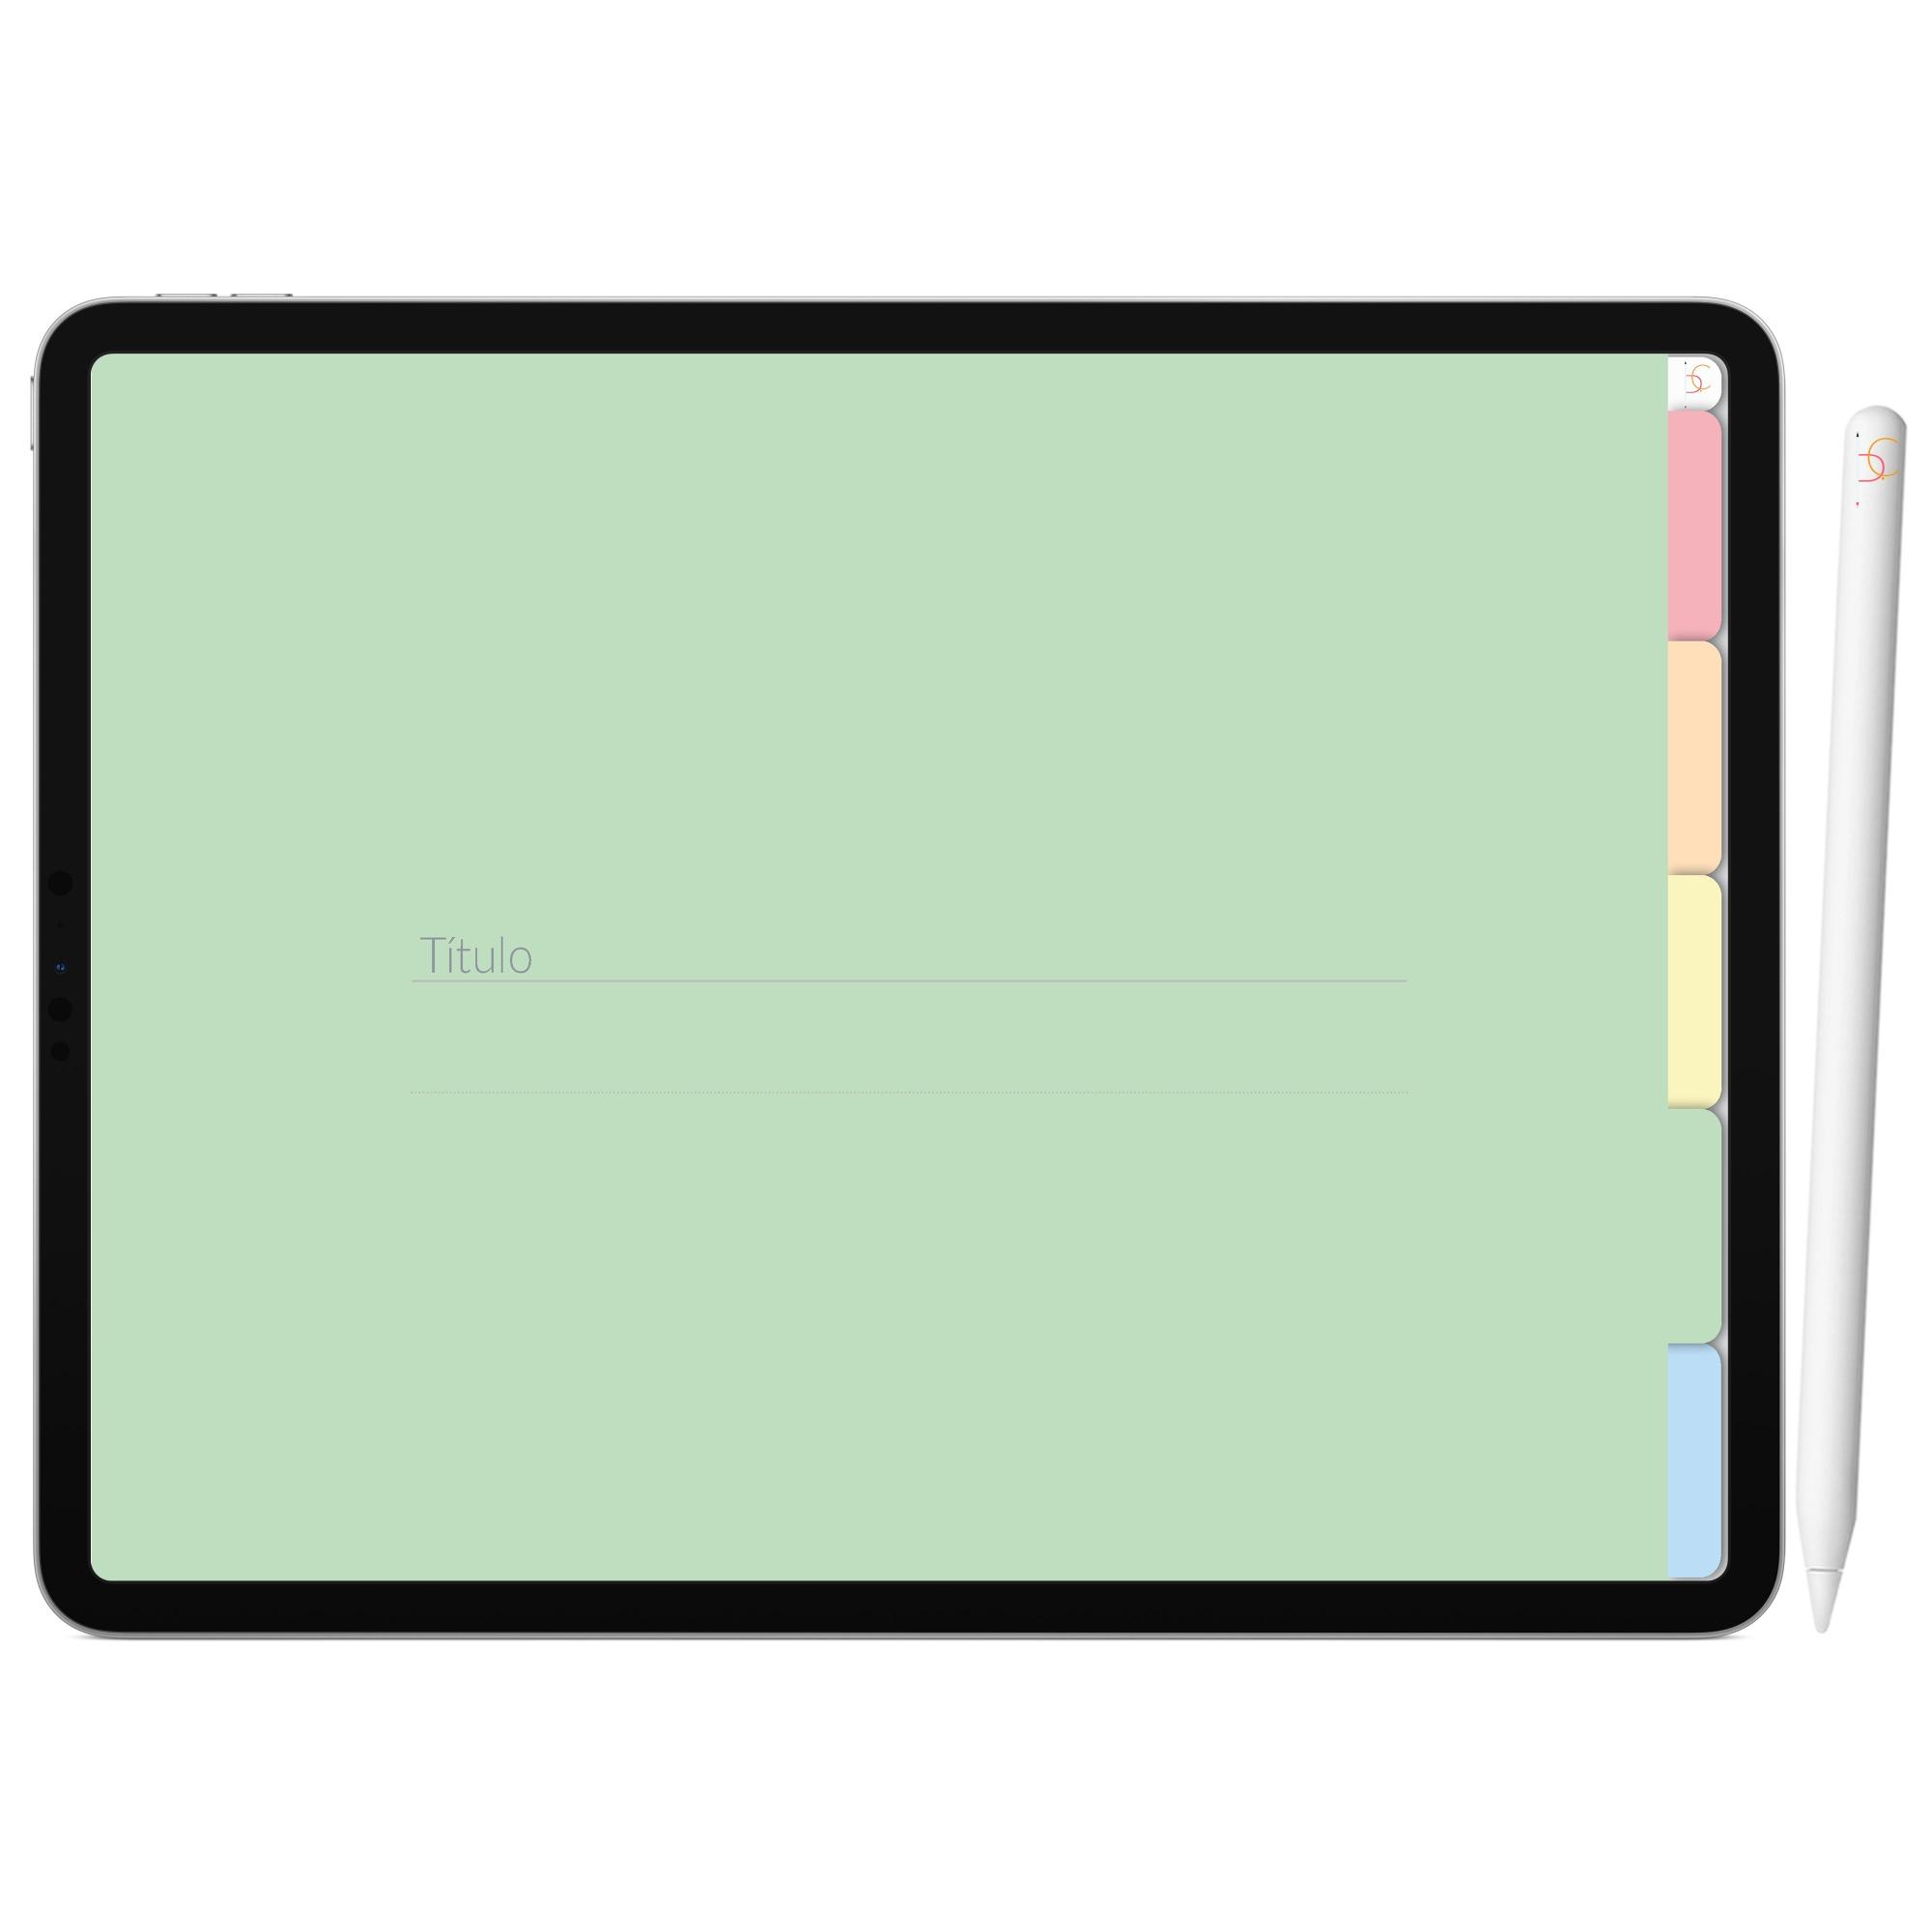 Mapa Mental Digital Azul Arco-Íris | Cinco Matérias Interativo| iPad Tablet | Download Instantâneo